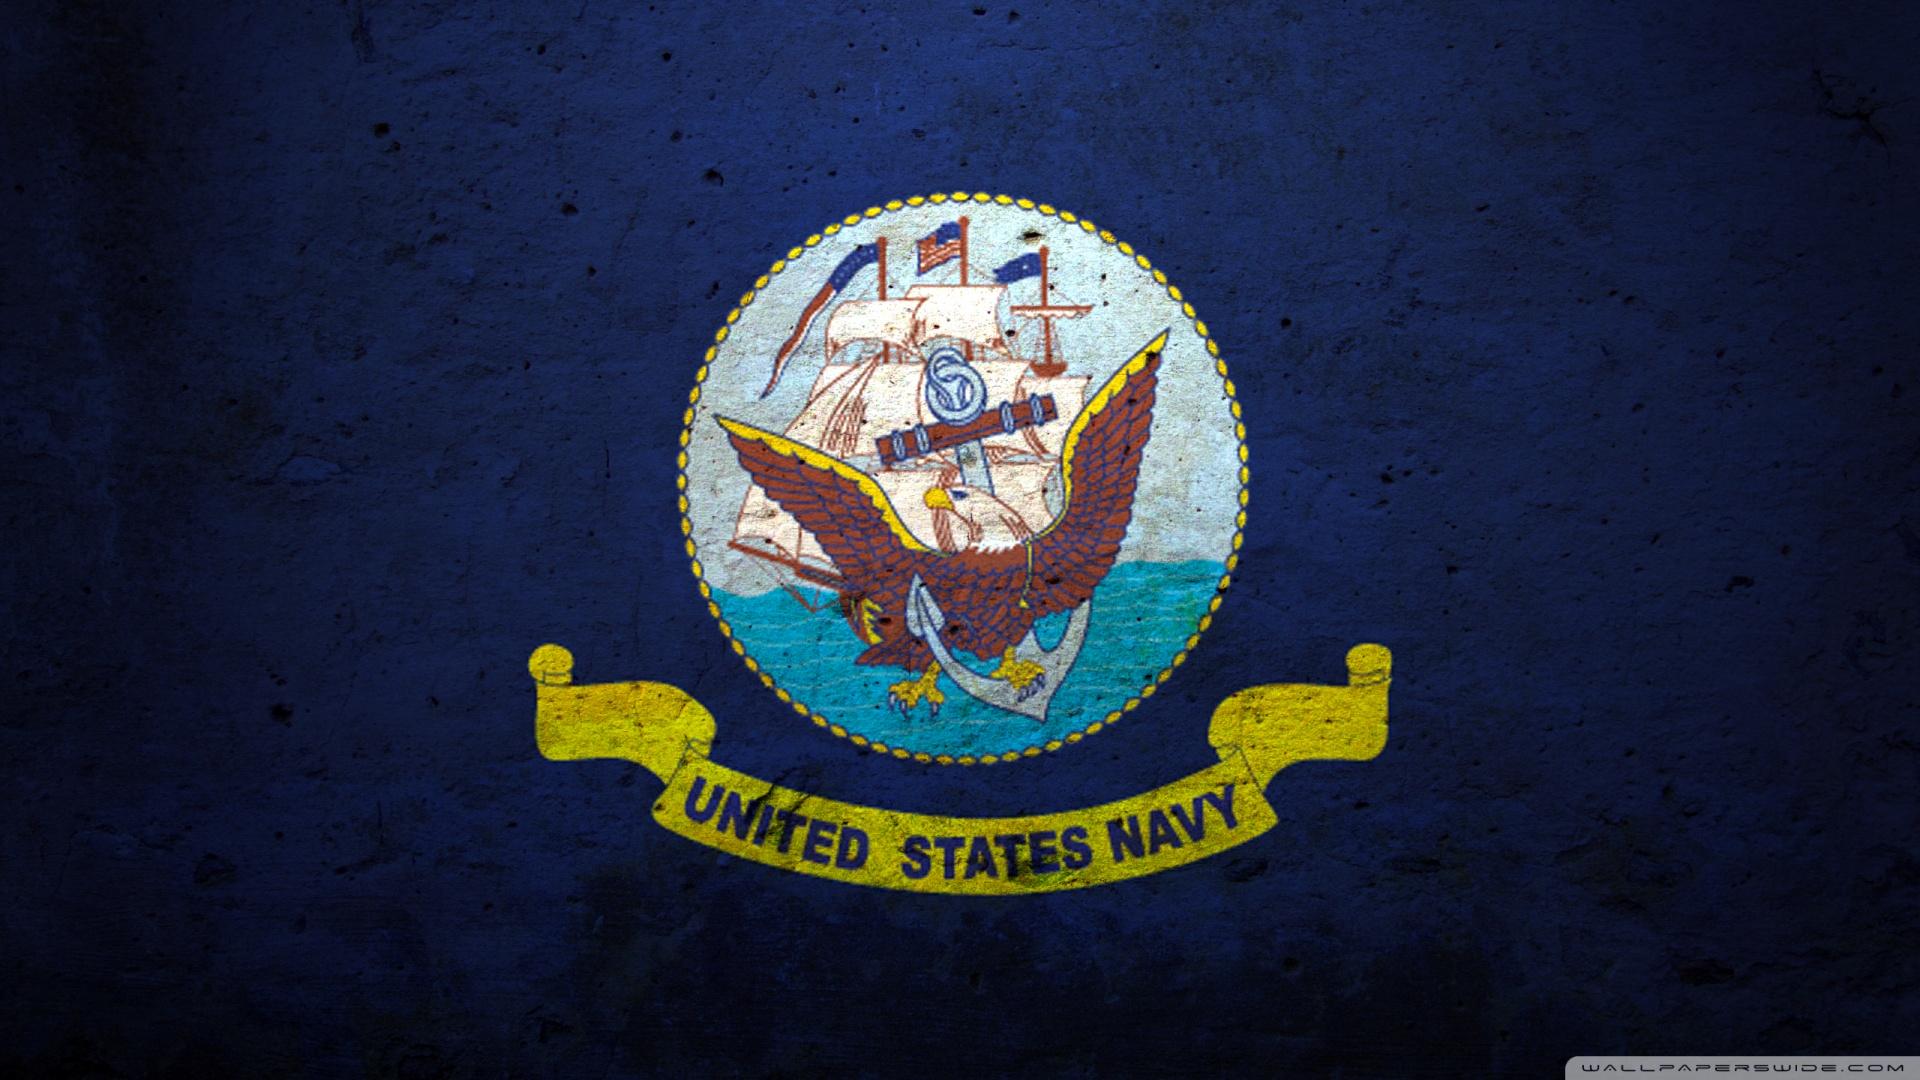 United States Navy Wallpaper 1920x1080